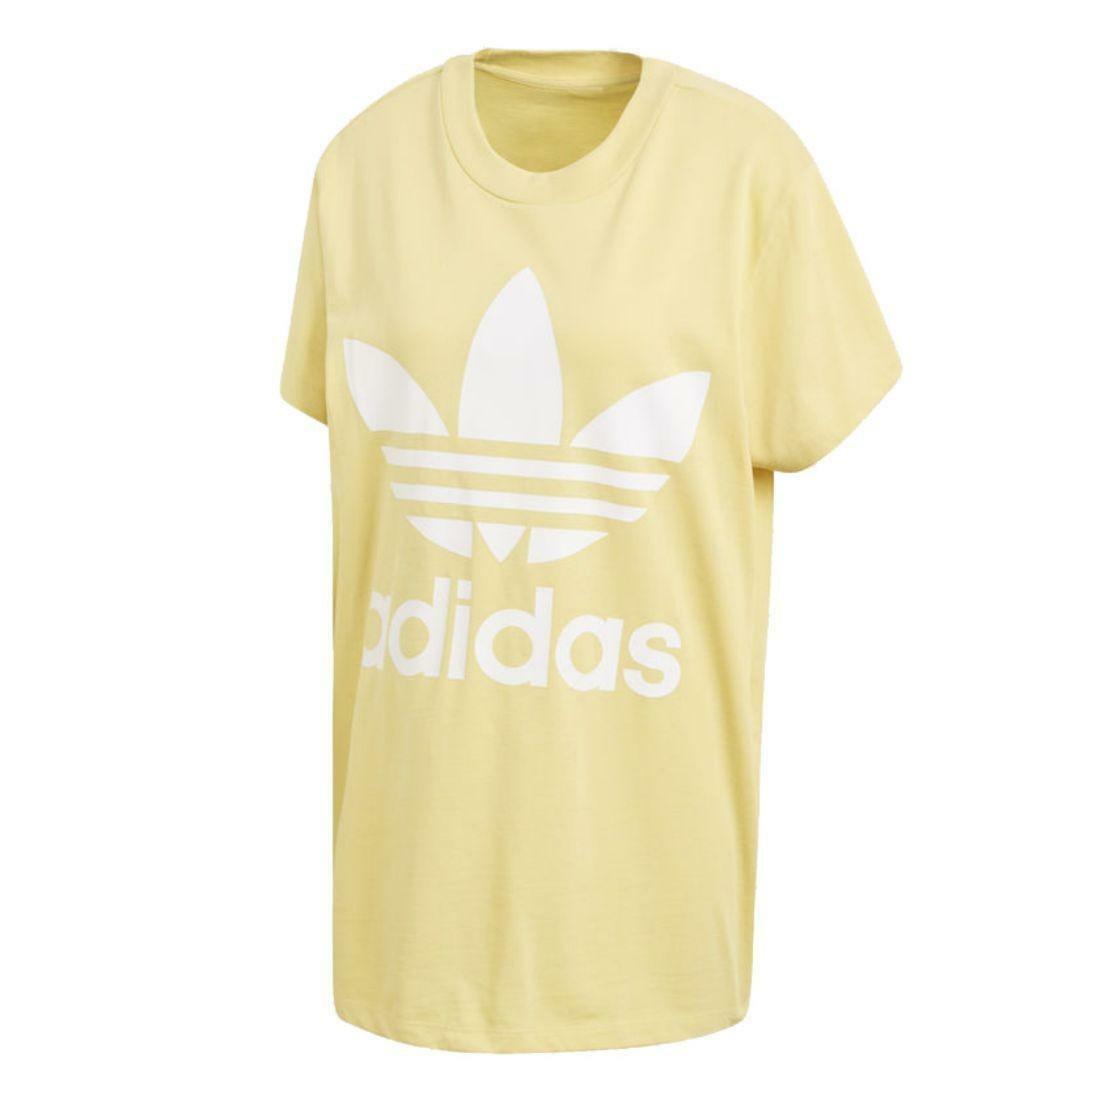 adidas adidas big treoil tee t-shirt donna gialla